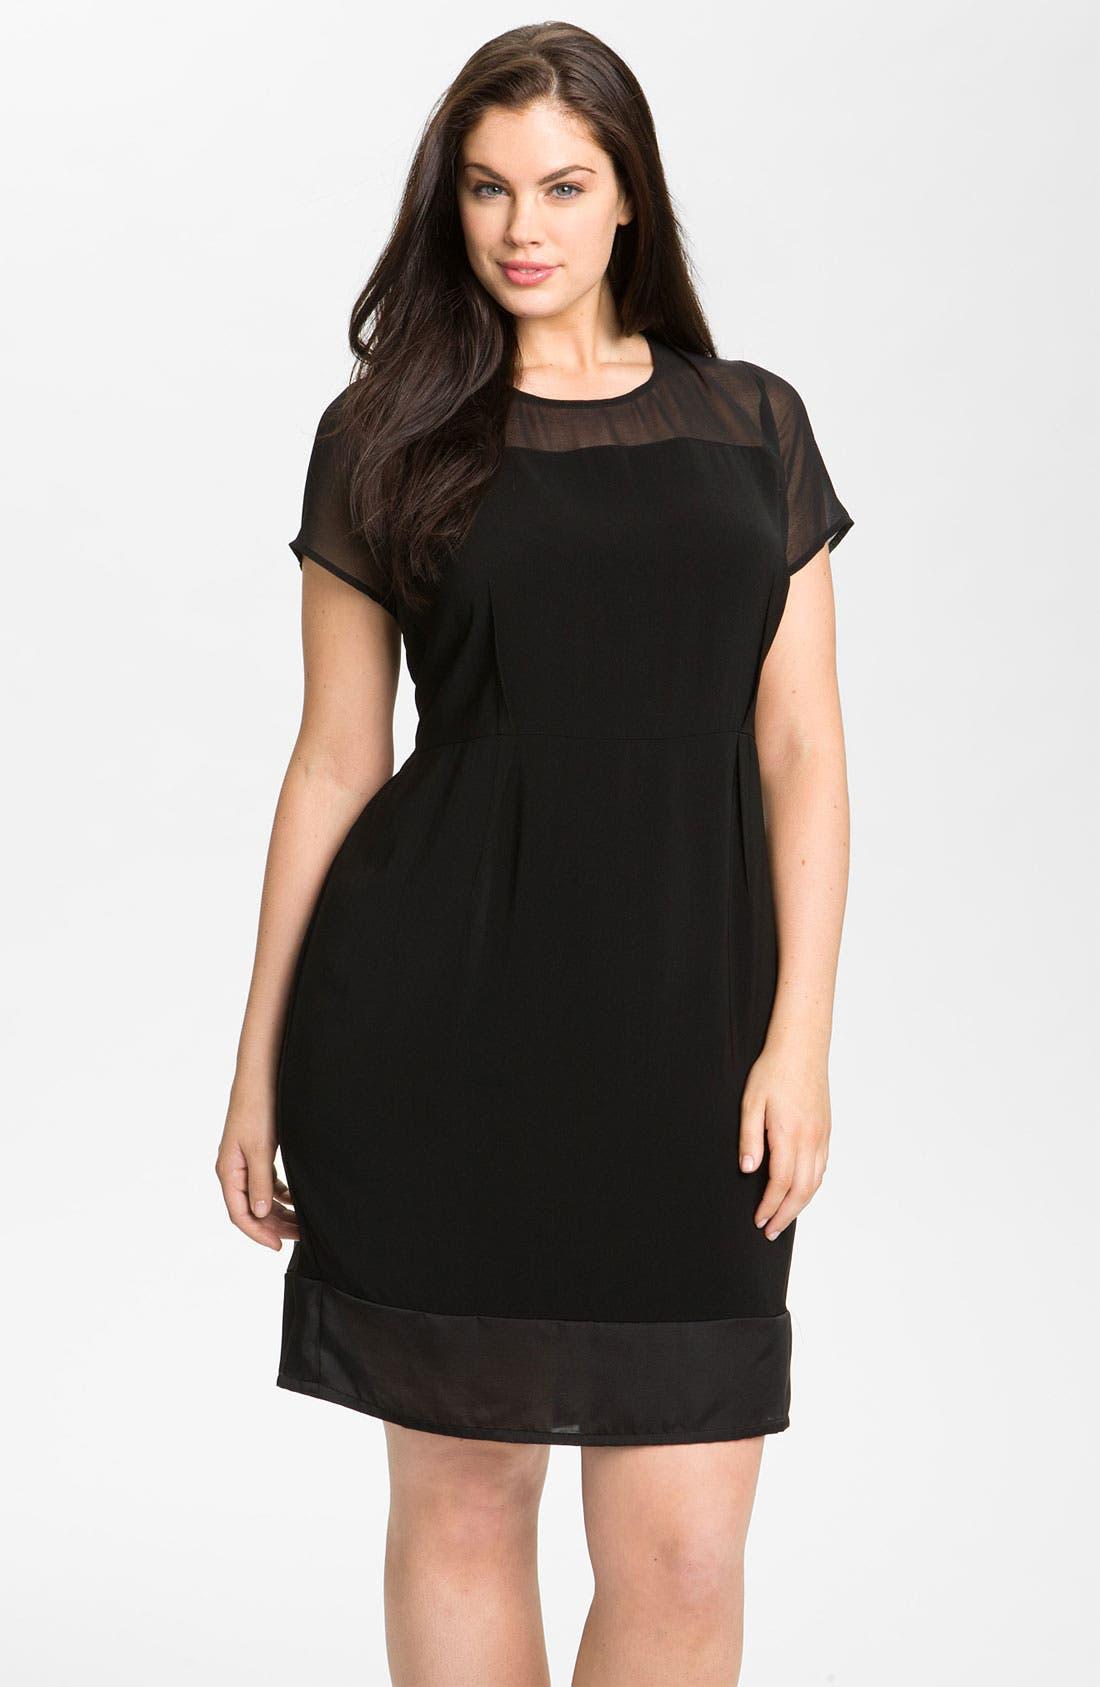 Alternate Image 1 Selected - DKNYC Georgette Trim Shift Dress (Plus)